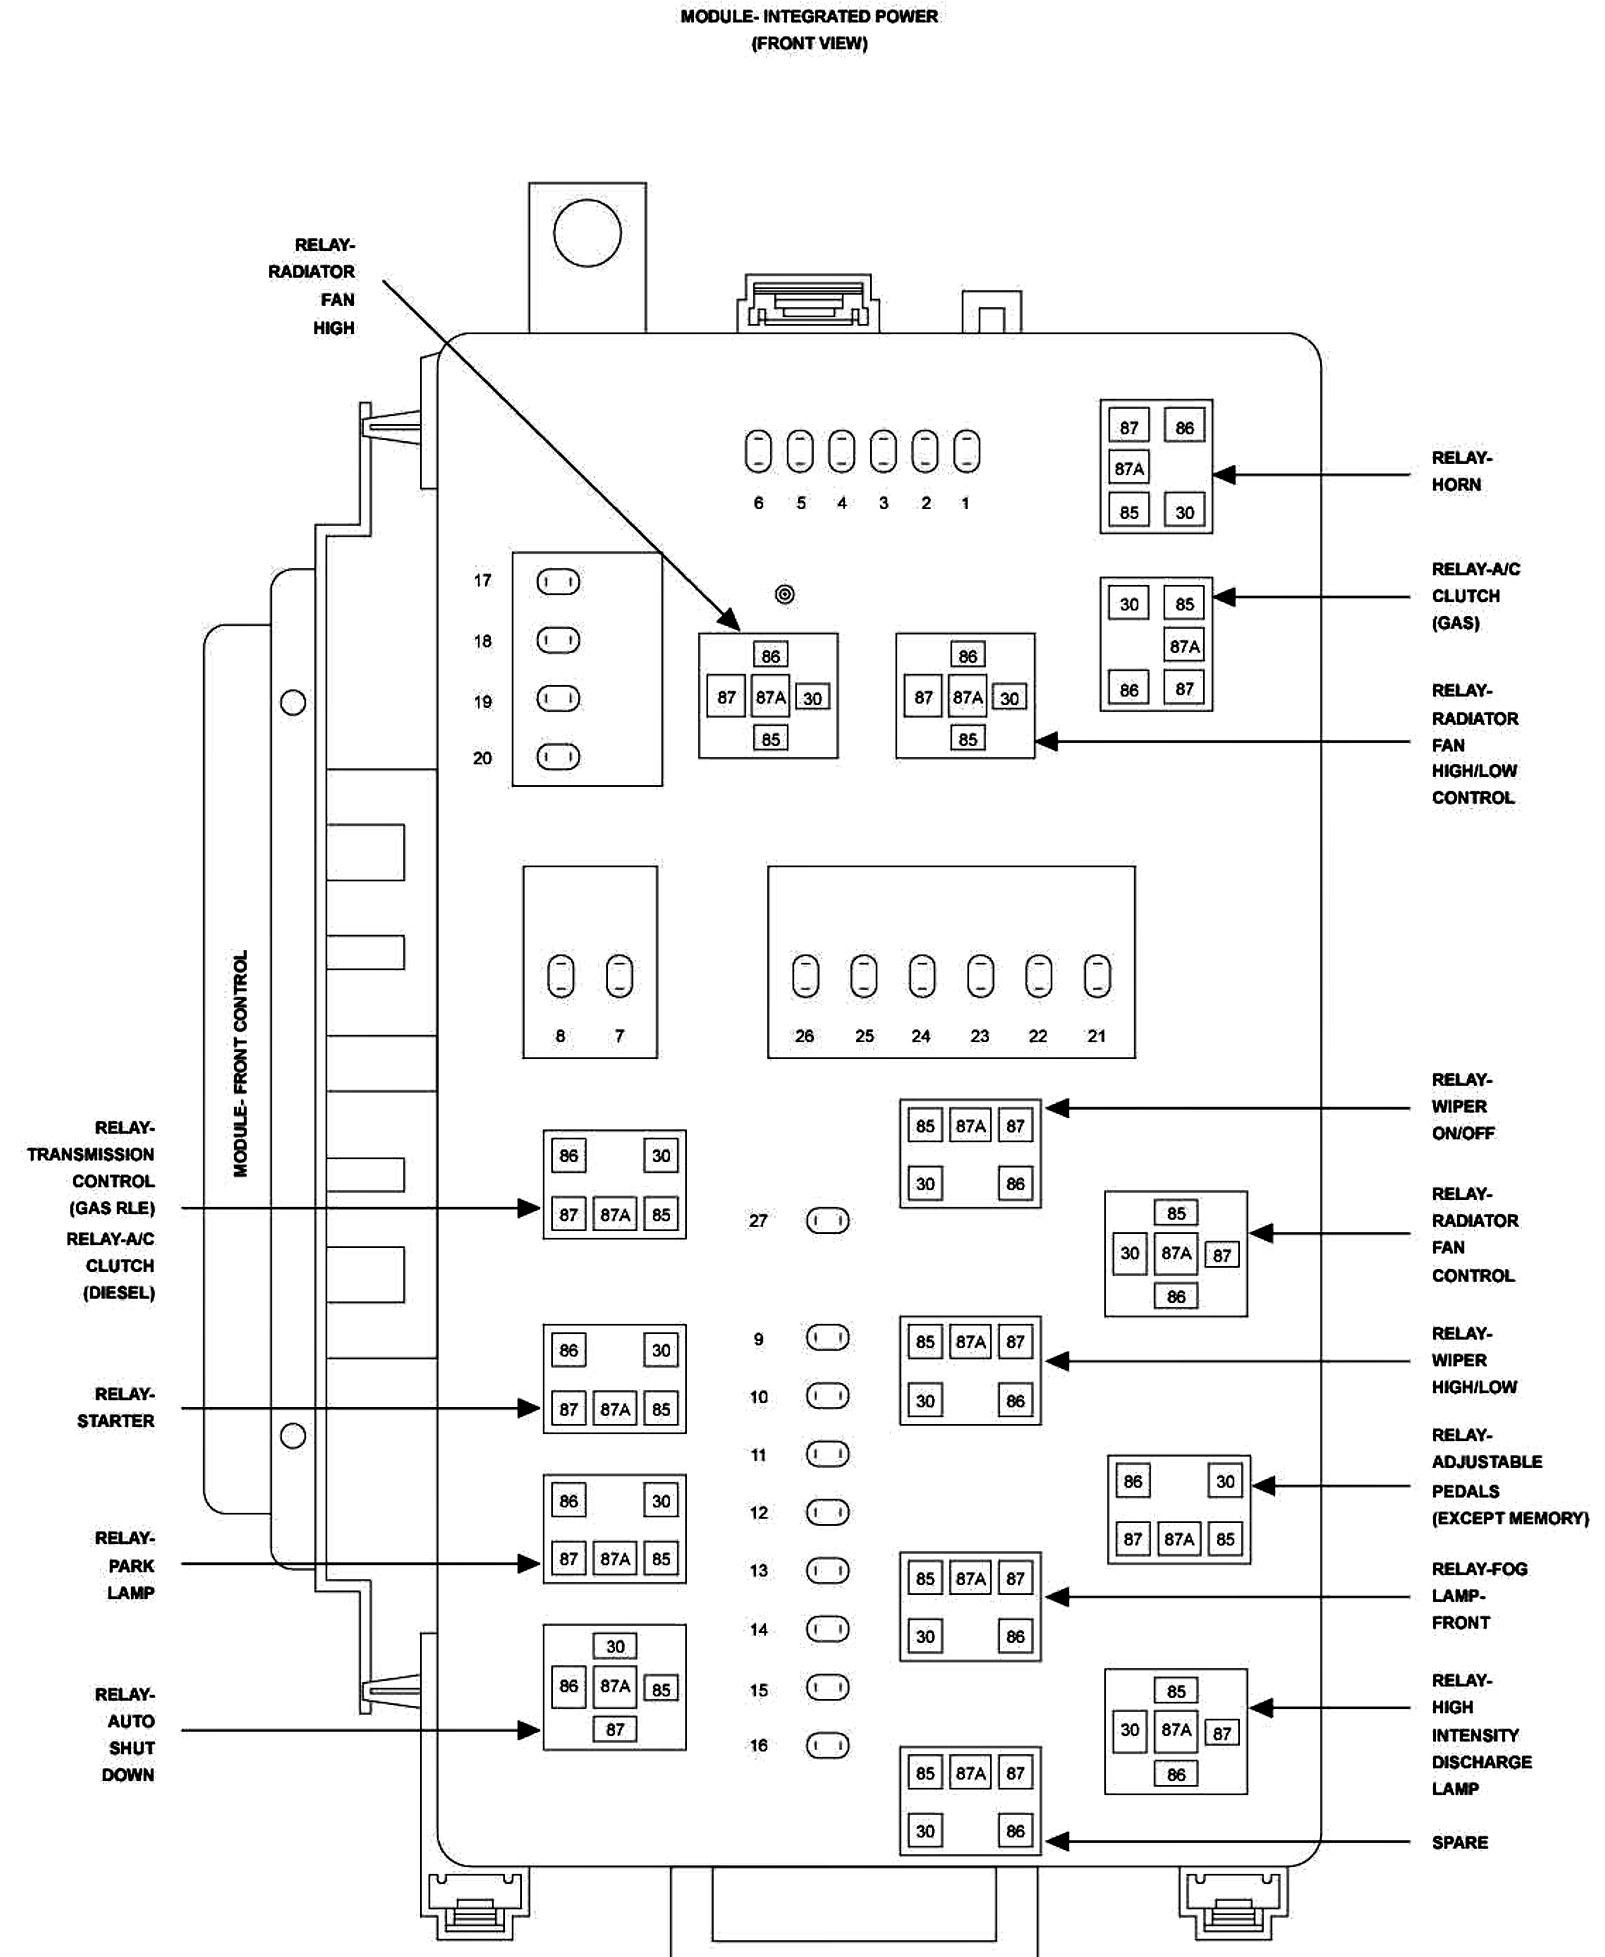 2007 Dodge Dakota Fuse Diagram Data Wiring Diagram Skip Greet Skip Greet Vivarelliauto It